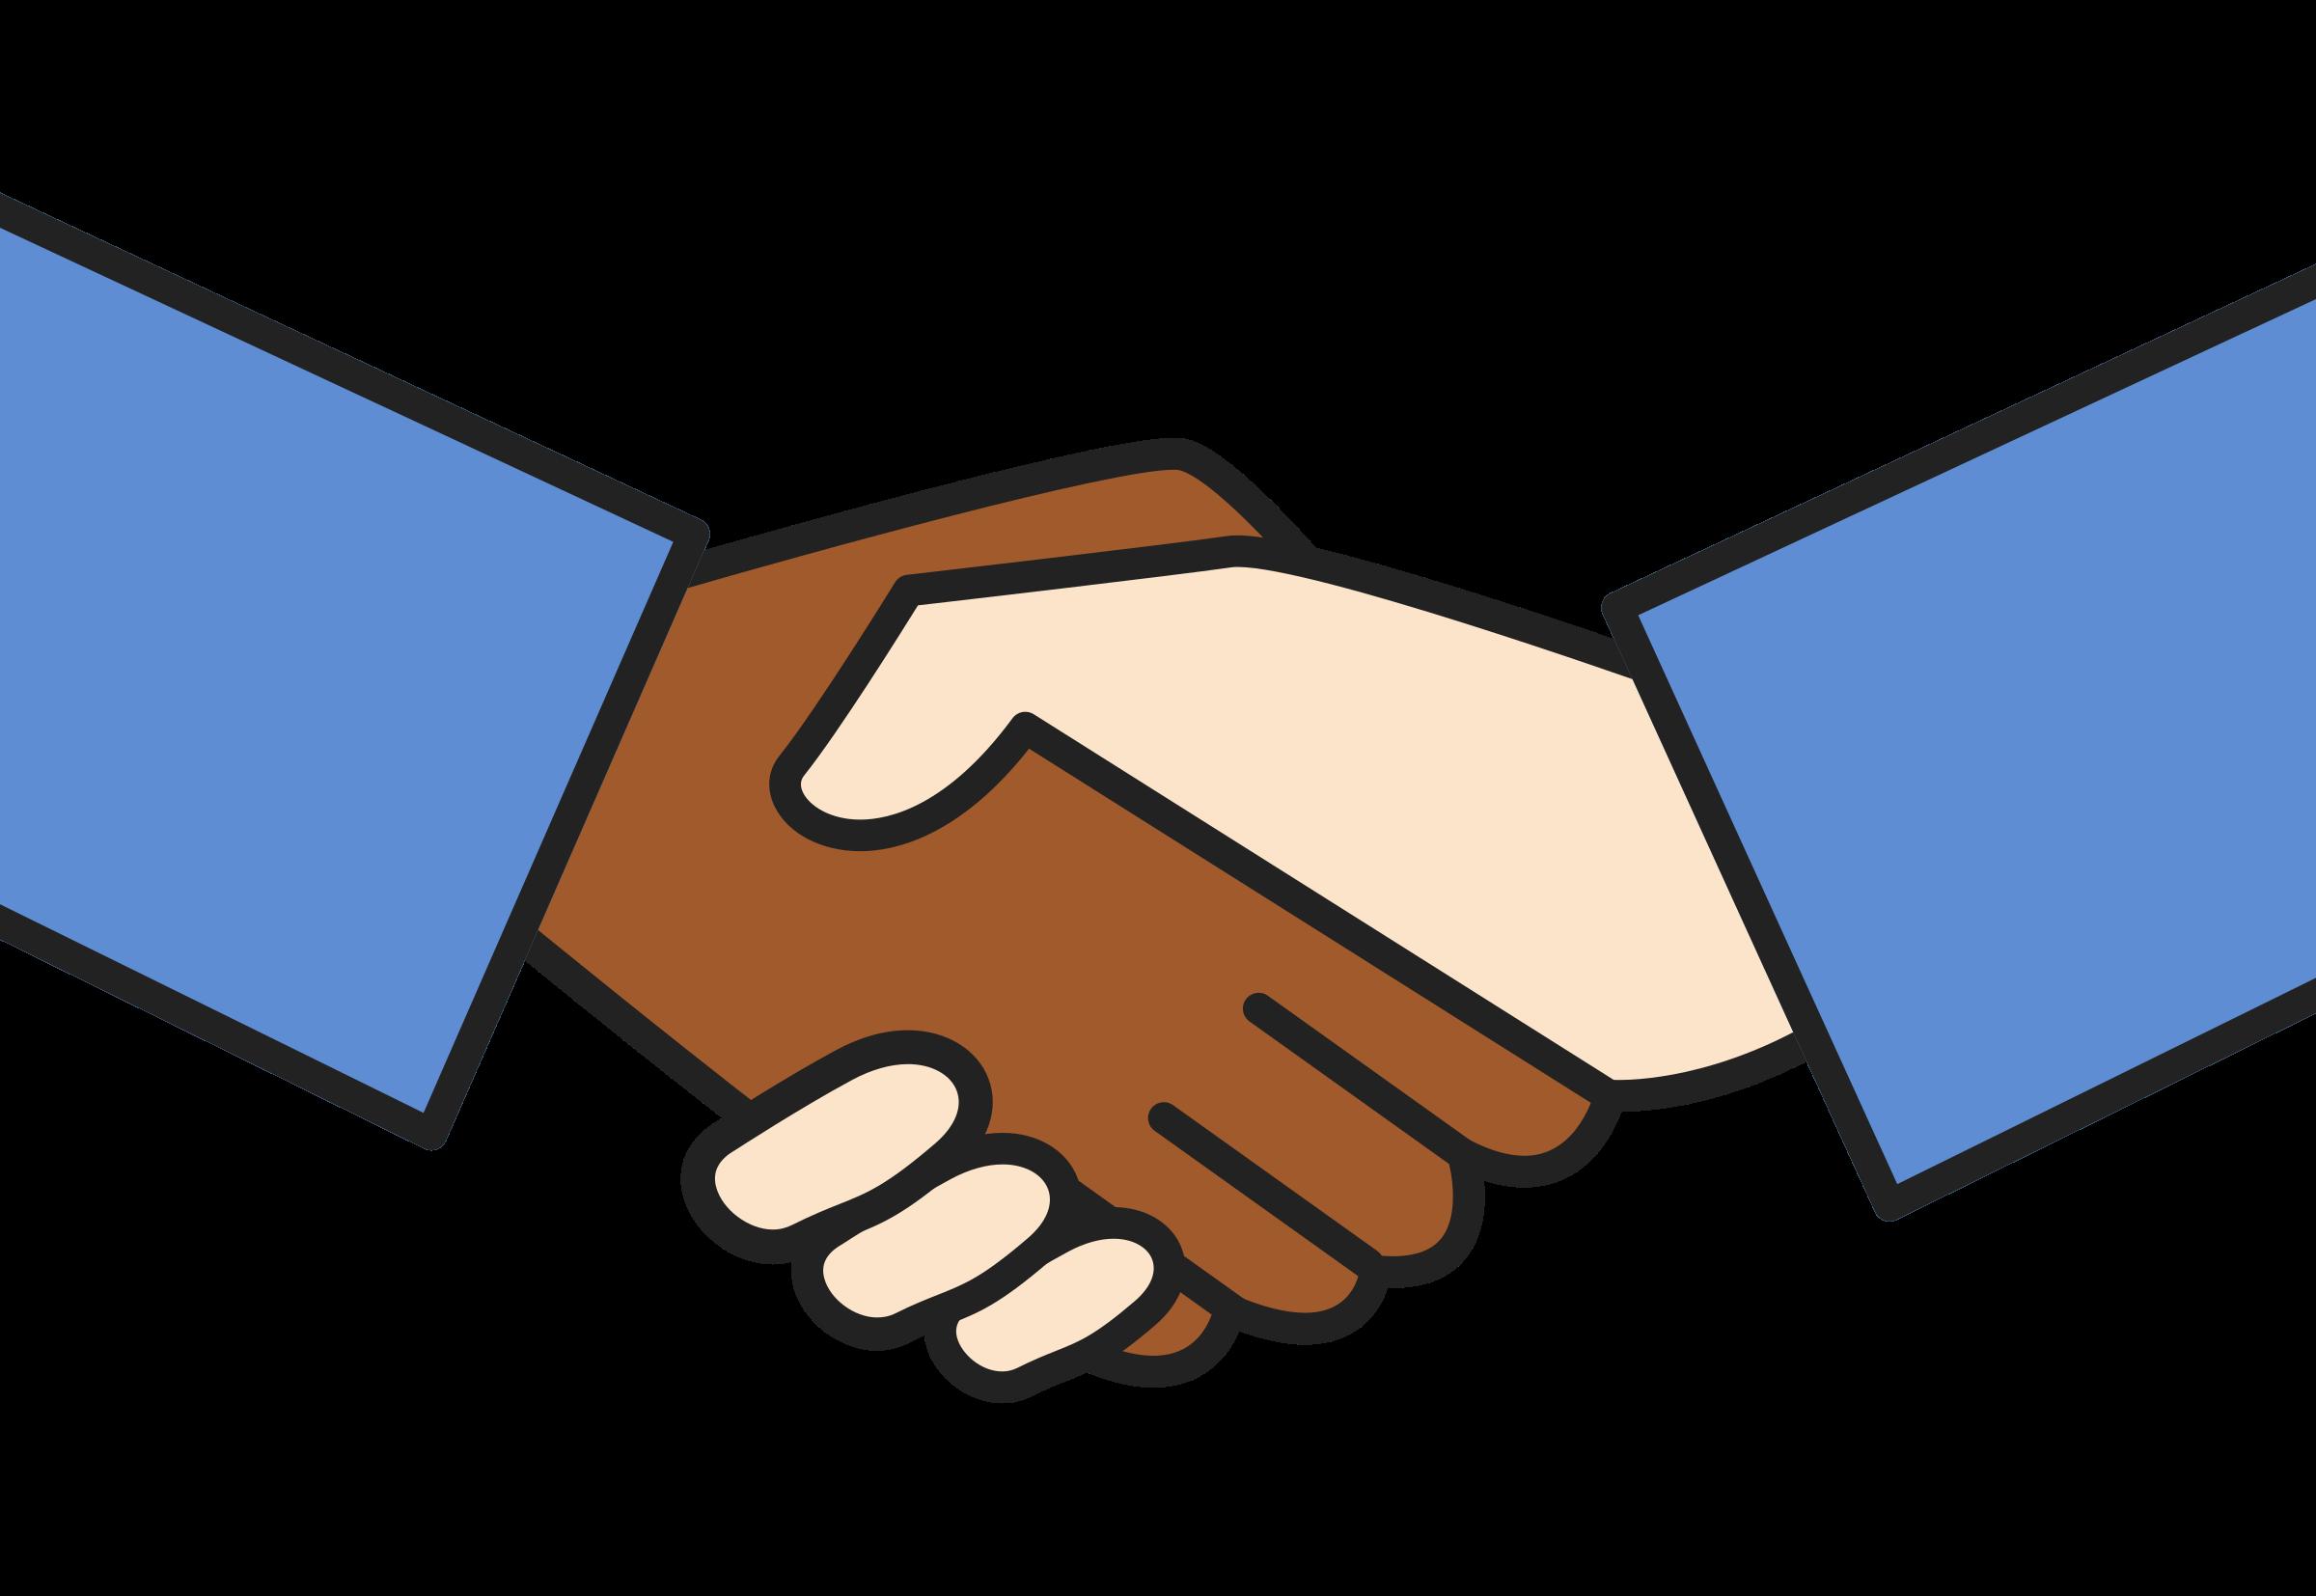 clipart handshake worker unite rh openclipart org handshake clipart transparent handshake clip art images